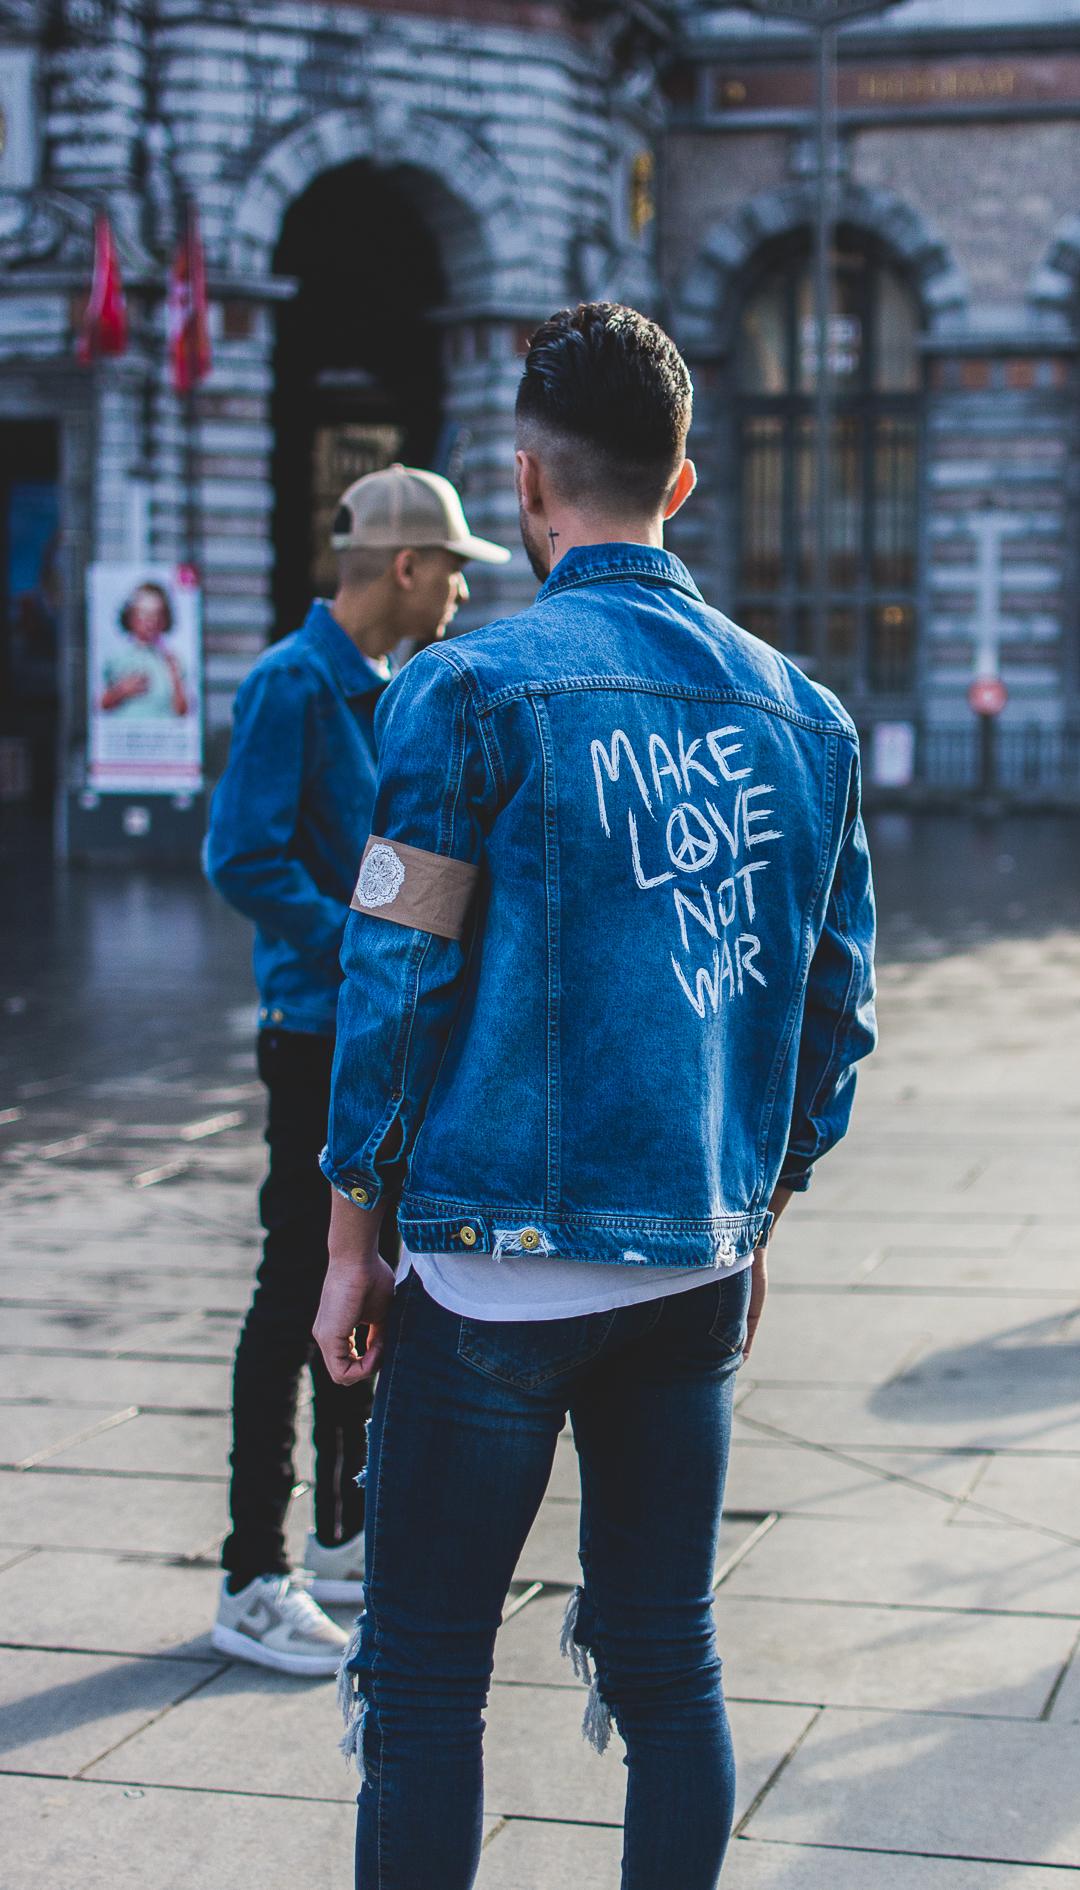 Men Make Love Not War Denim Jacket